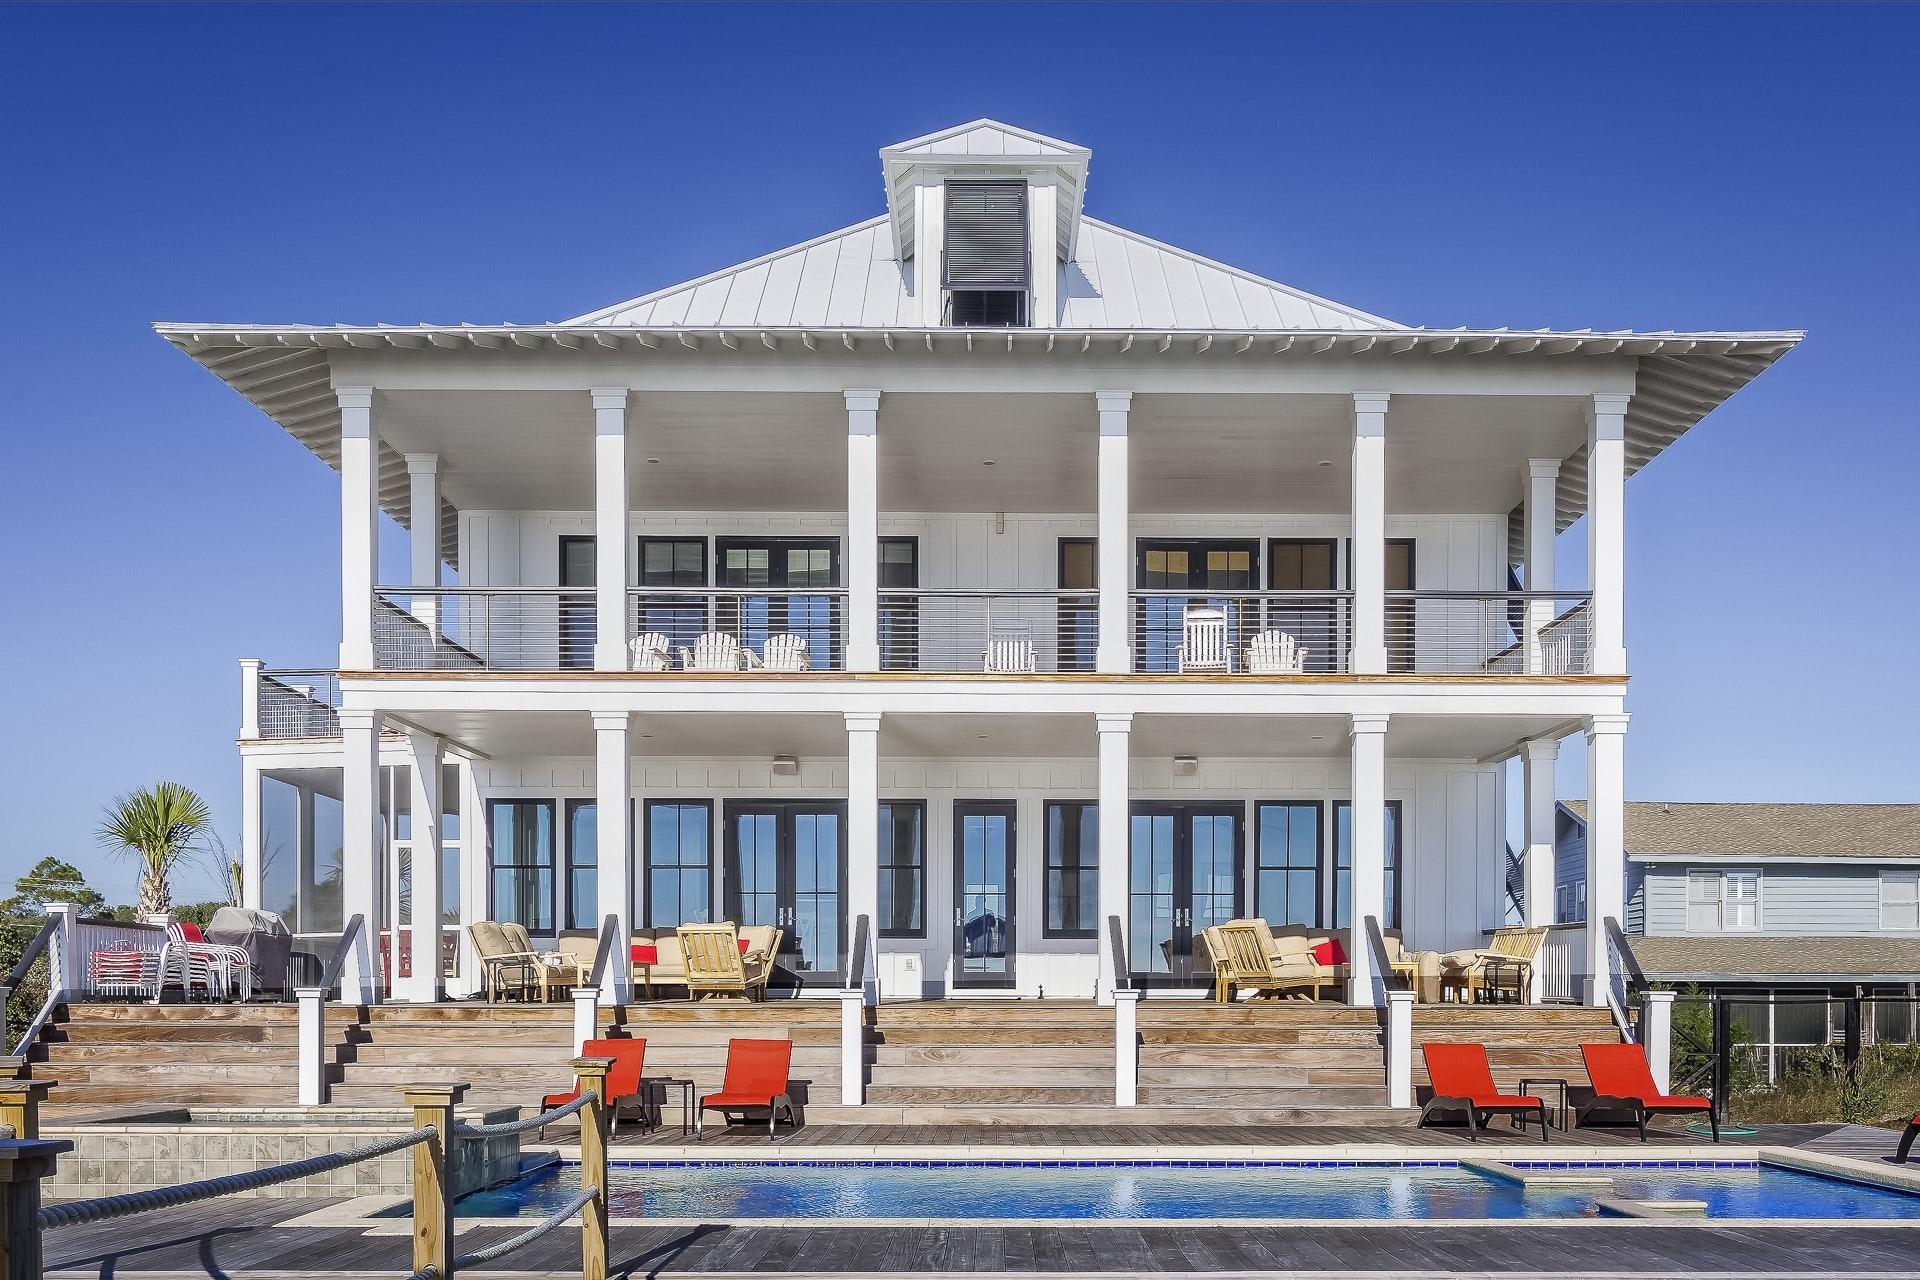 Real Estate Sales/Marketing Consulting + Design